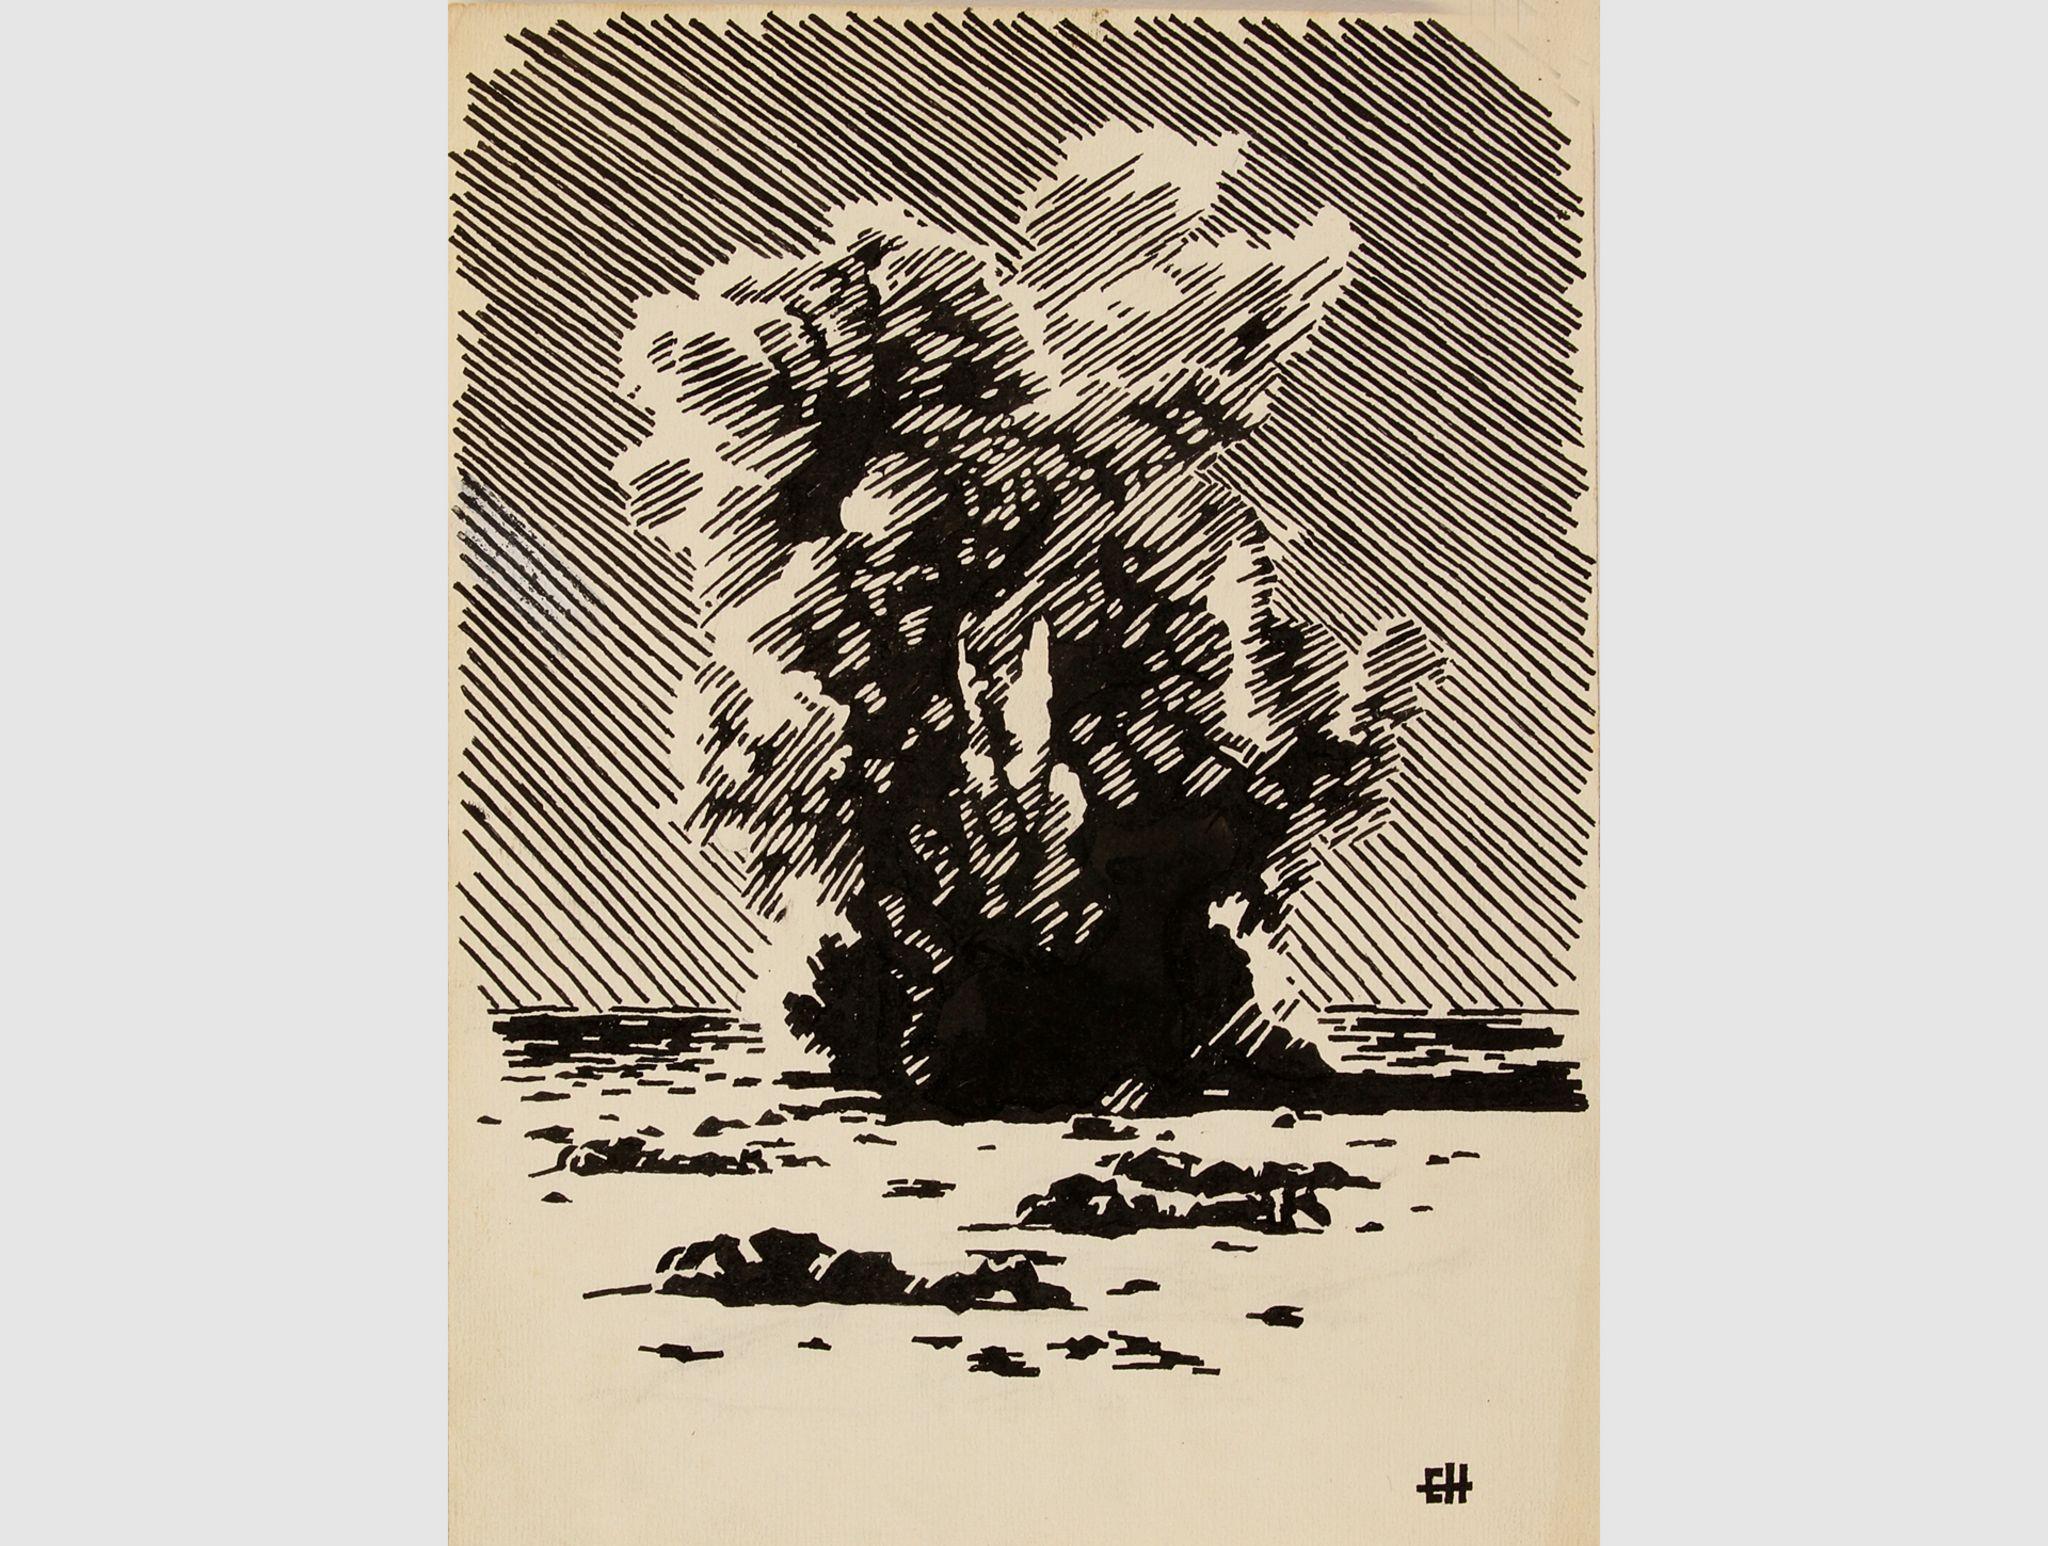 Mortar shelling at Portella, 1944